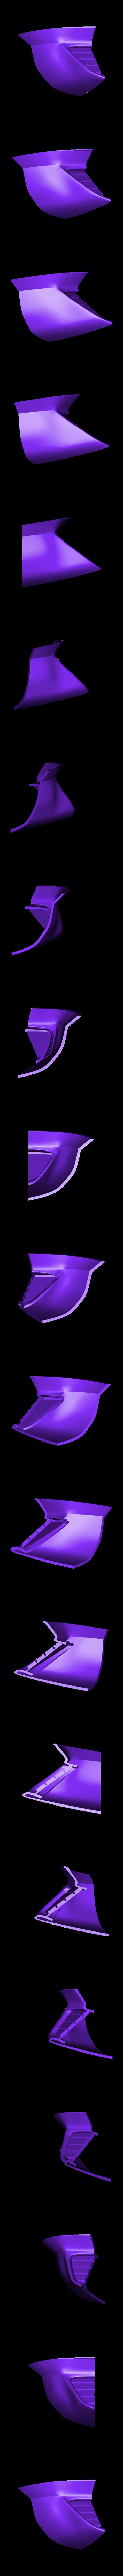 Part 1 v1.stl Download STL file ARF Trooper Helmet • 3D print object, VillainousPropShop